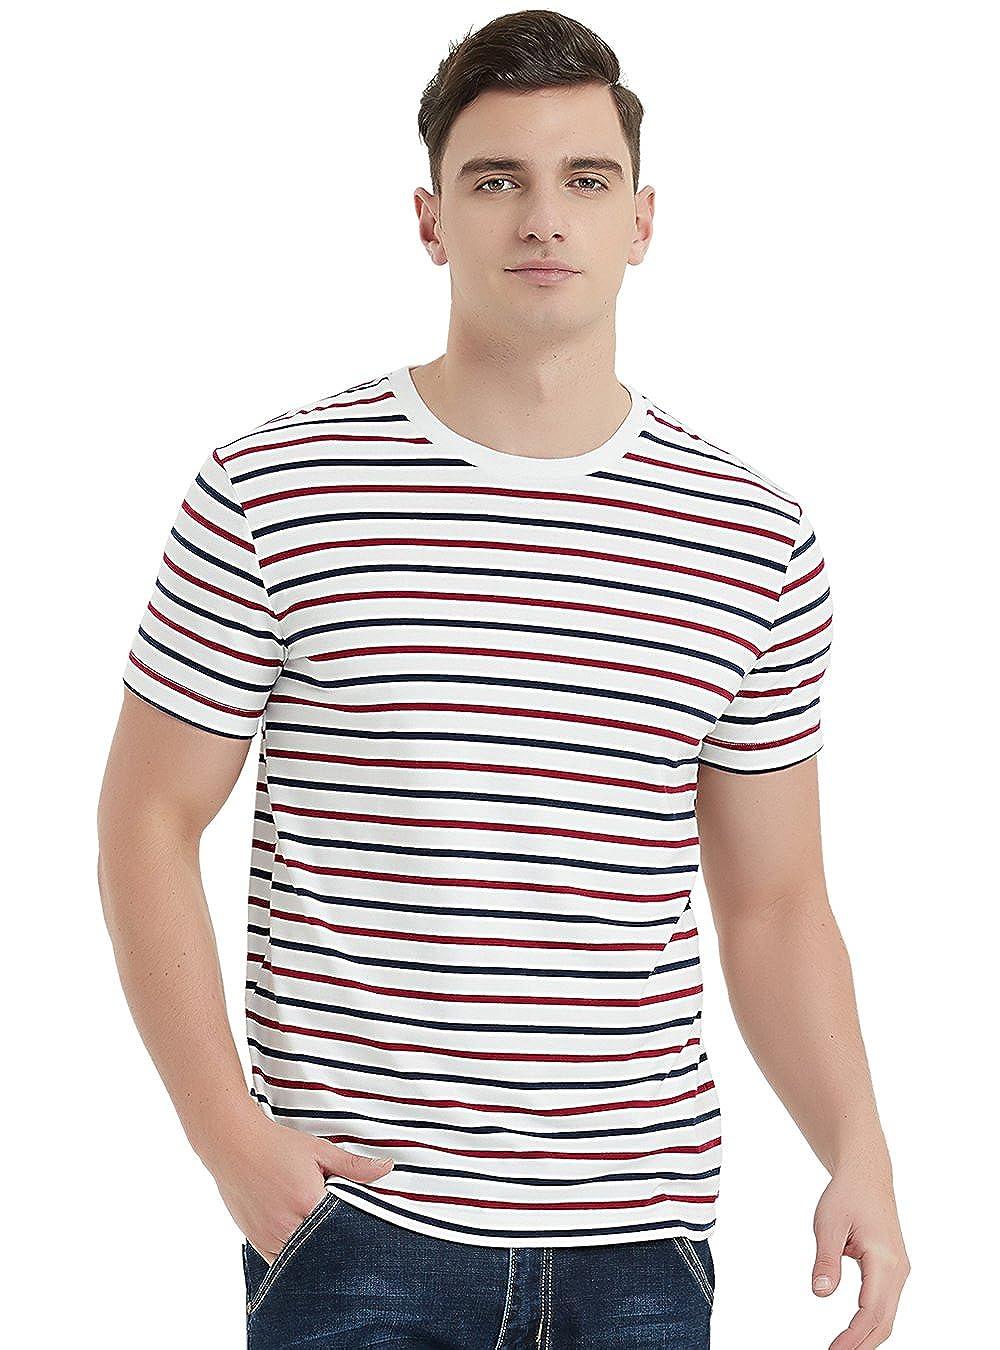 Navy & Red Stripes